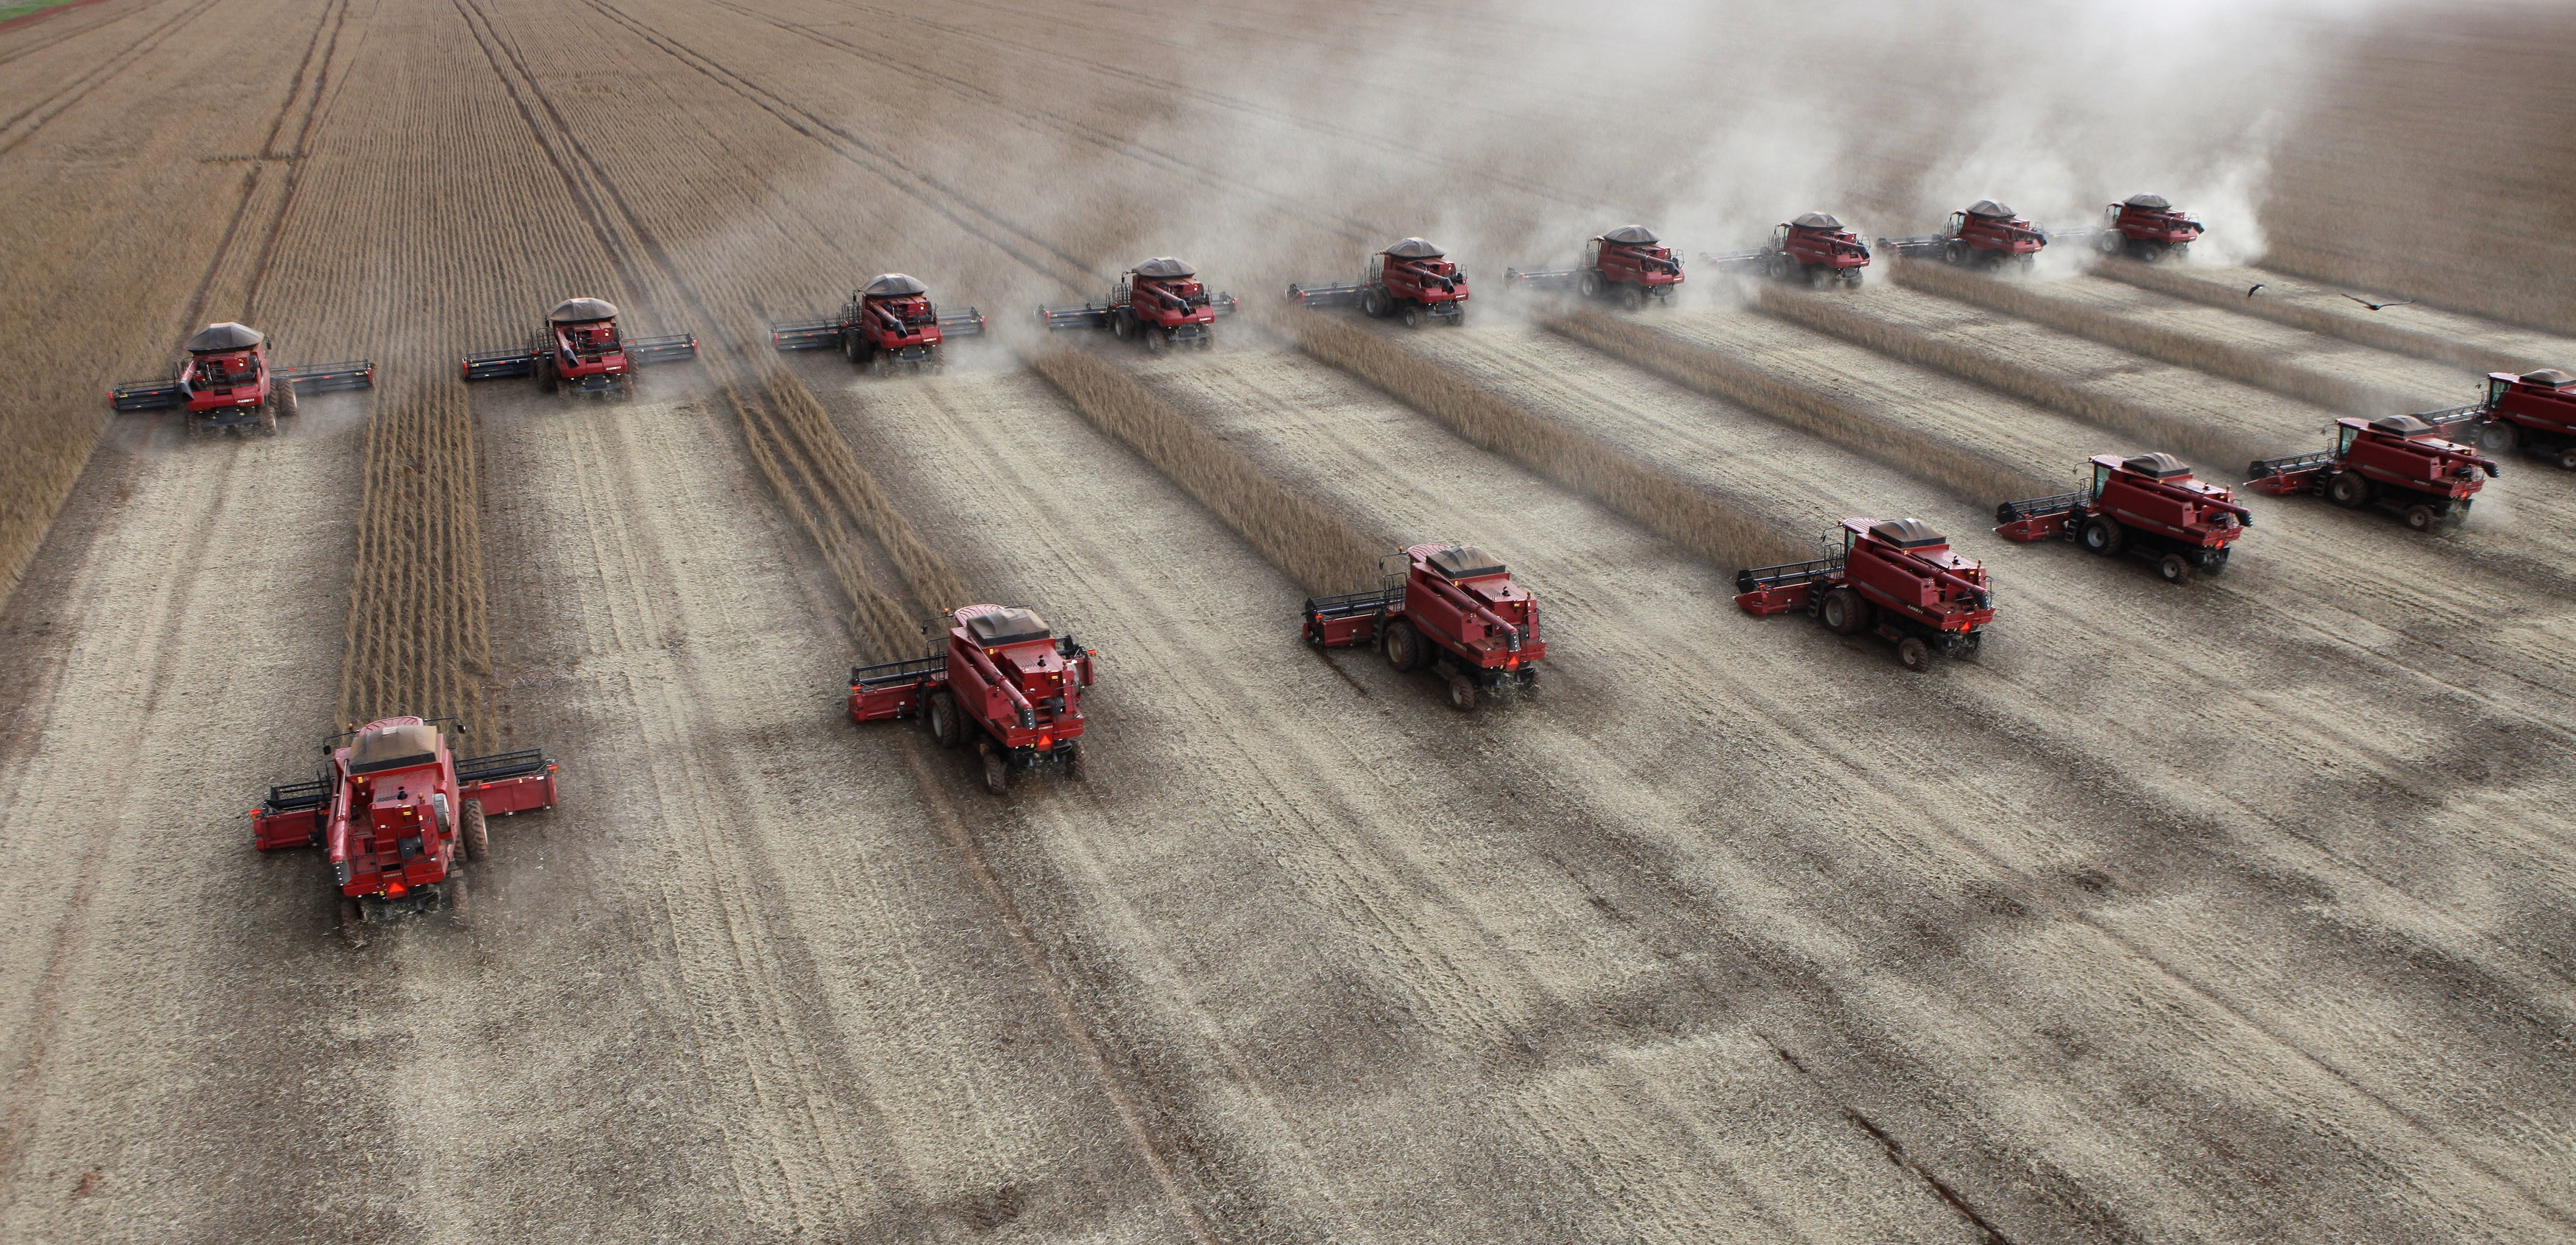 Colheita de soja em Tangará da Serra (MT) 27/03/2012 (Foto: Paulo Whitaker/Reuters)